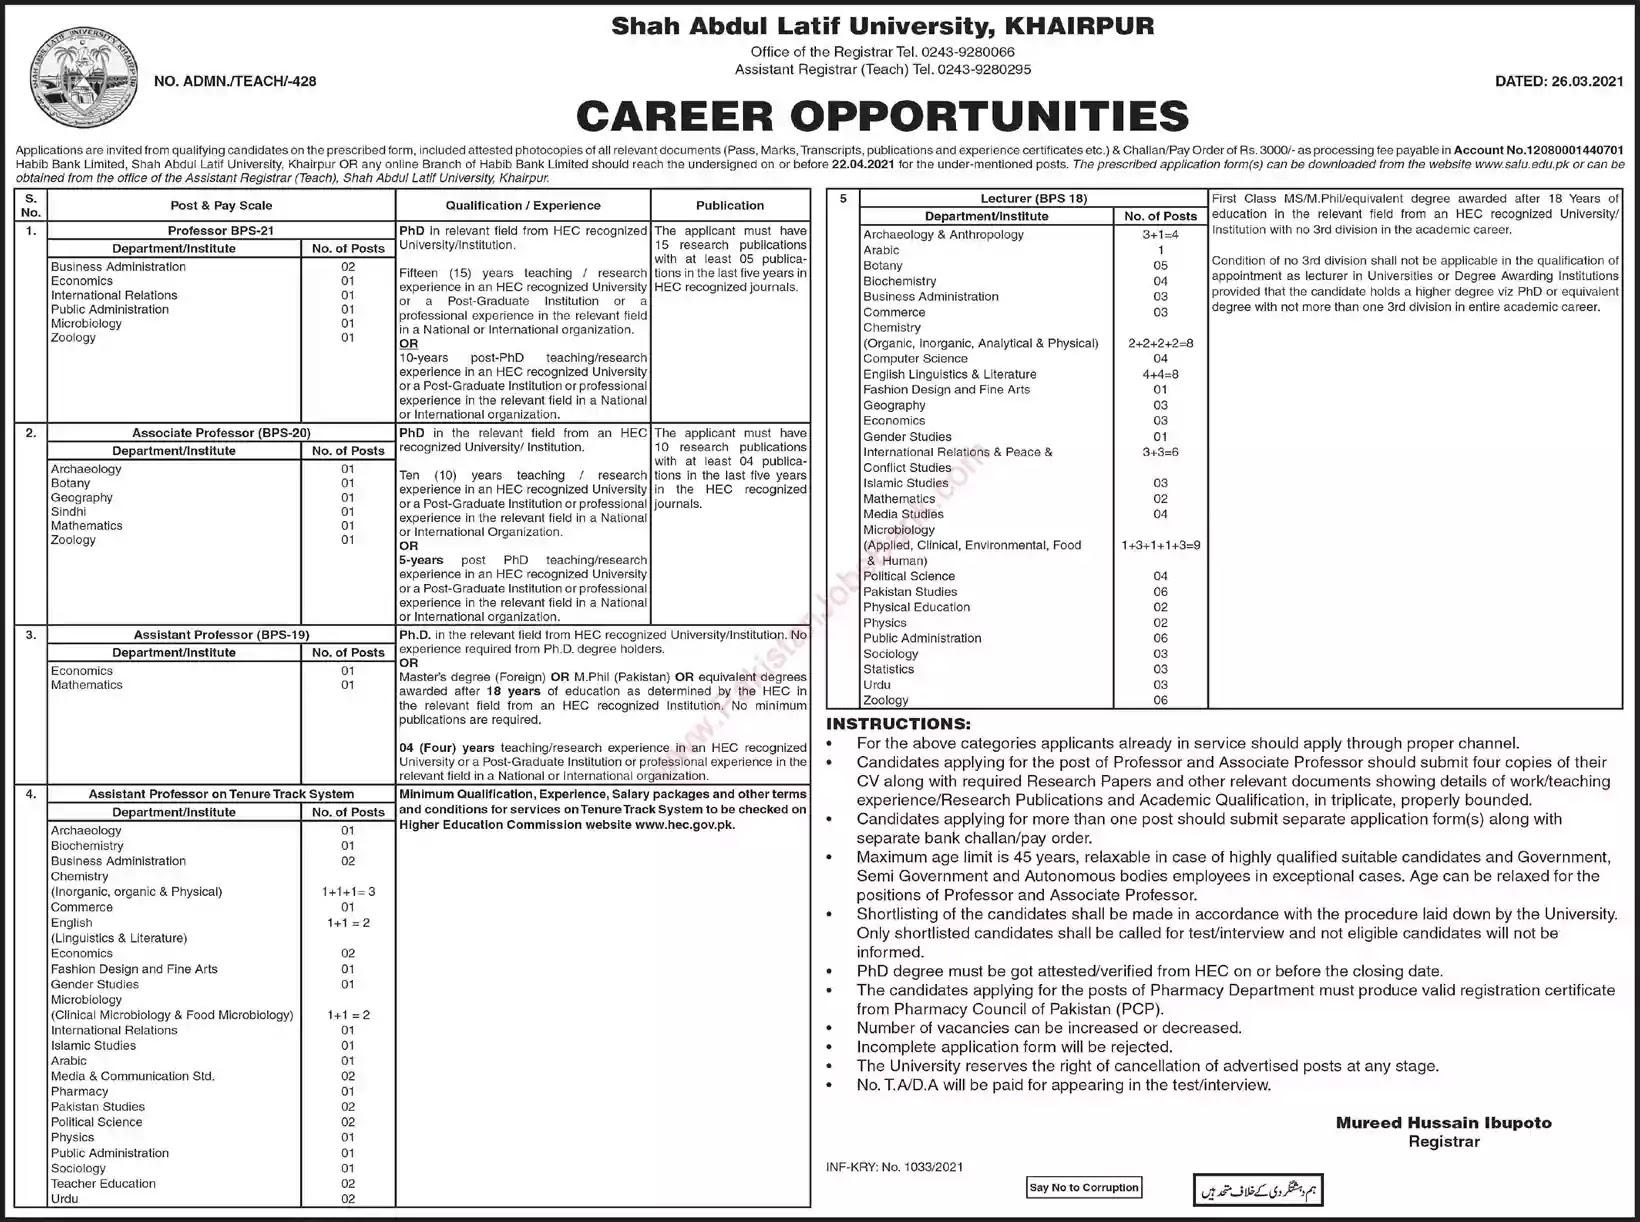 Shah Abdul Latif University Khairpur Jobs 2021   Download Application Form